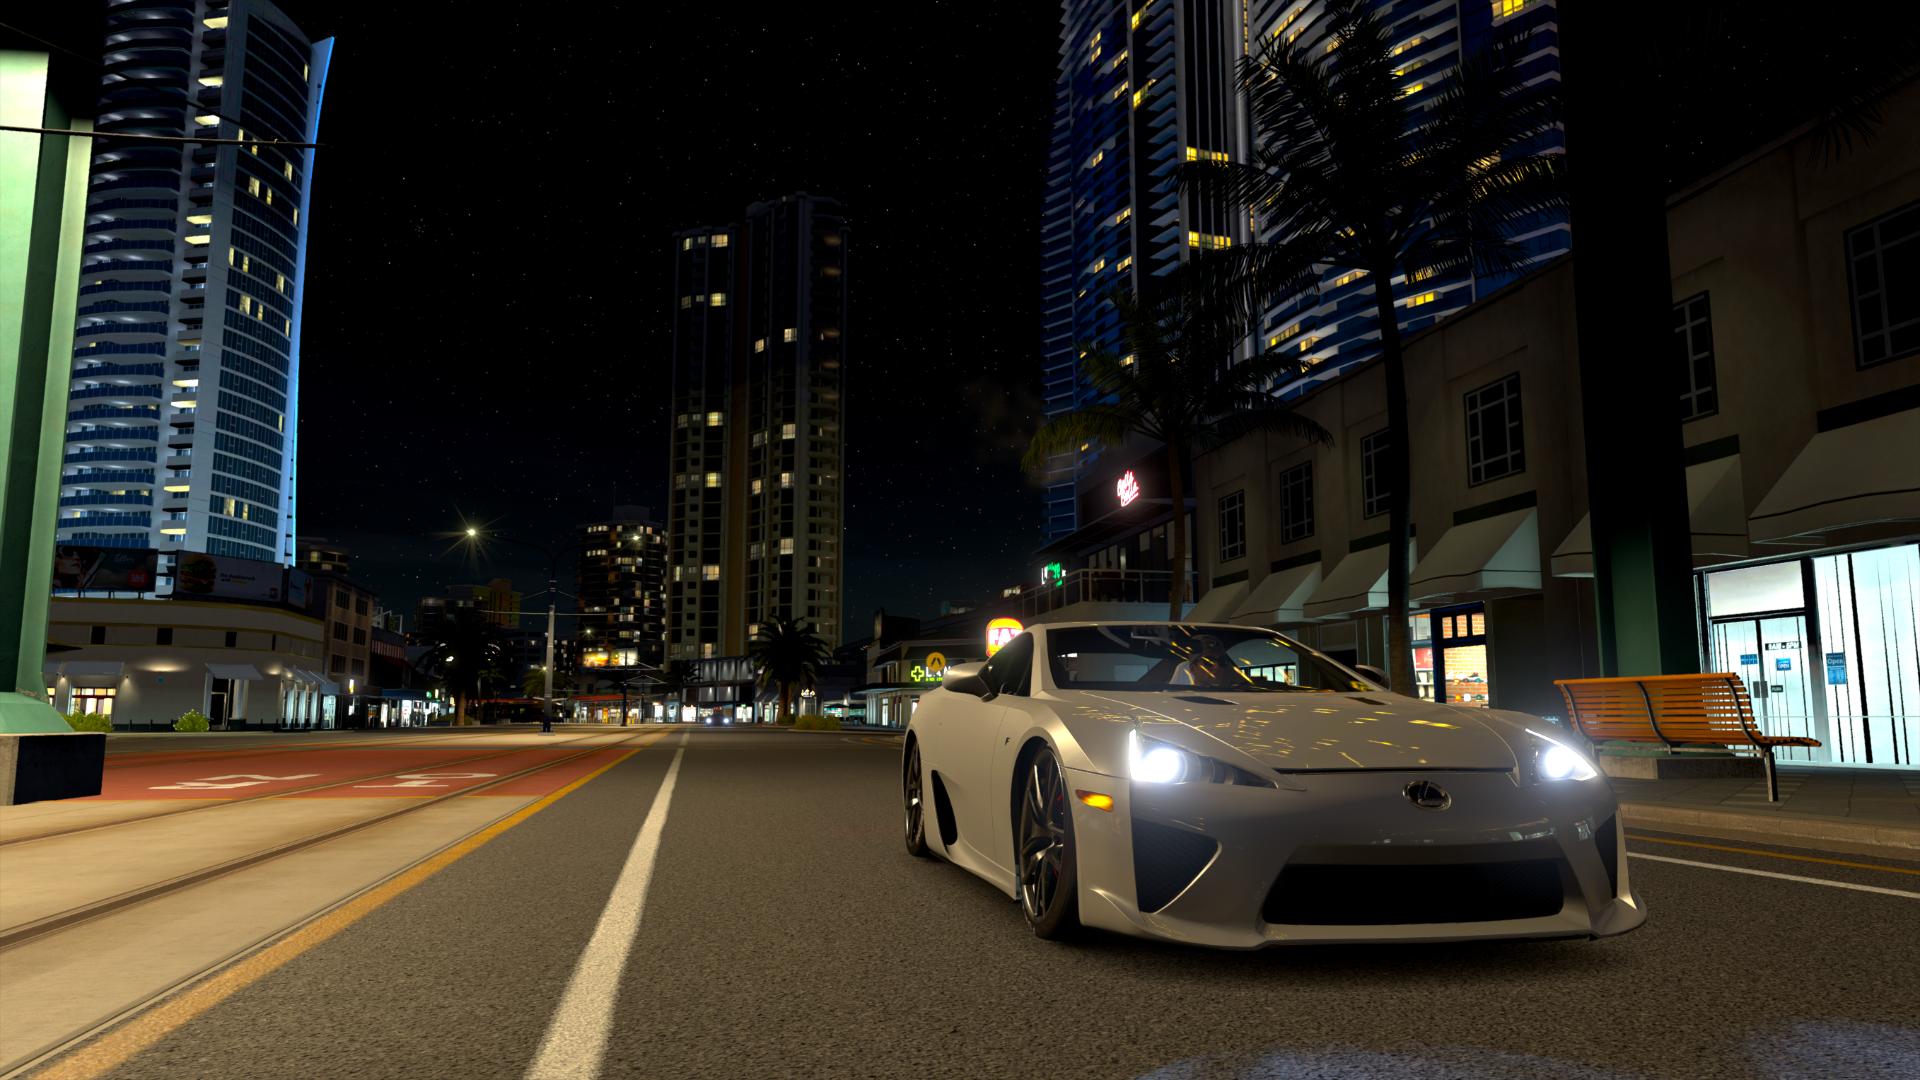 Video Game - Forza Horizon 3 Car Lexus LFA Wallpaper